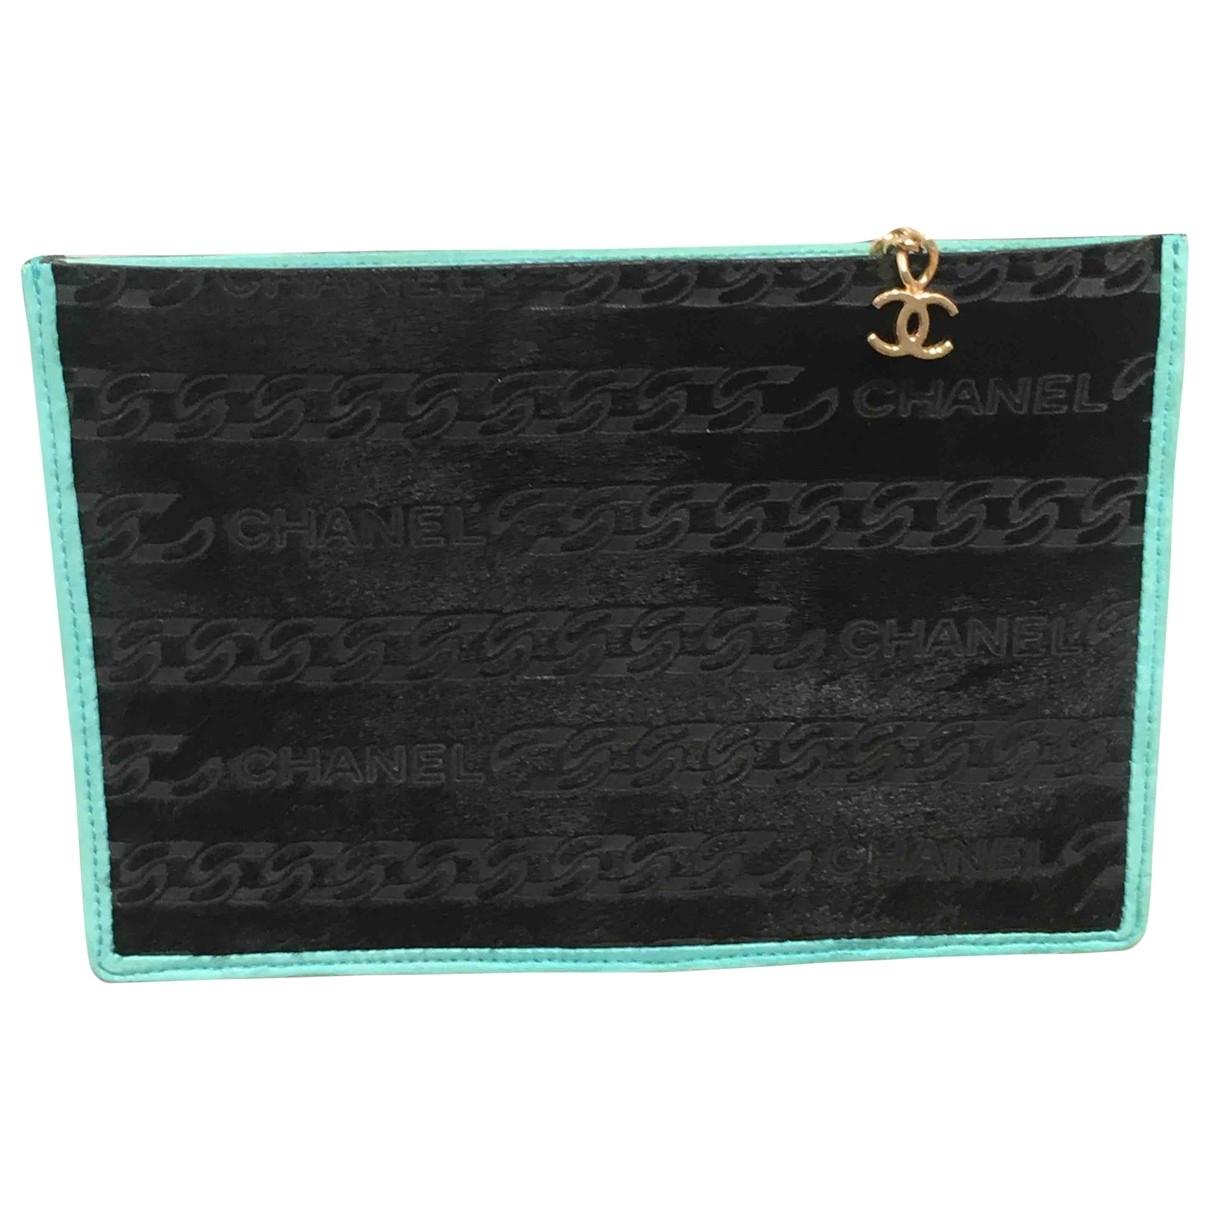 Chanel \N Black Pony-style calfskin Clutch bag for Women \N